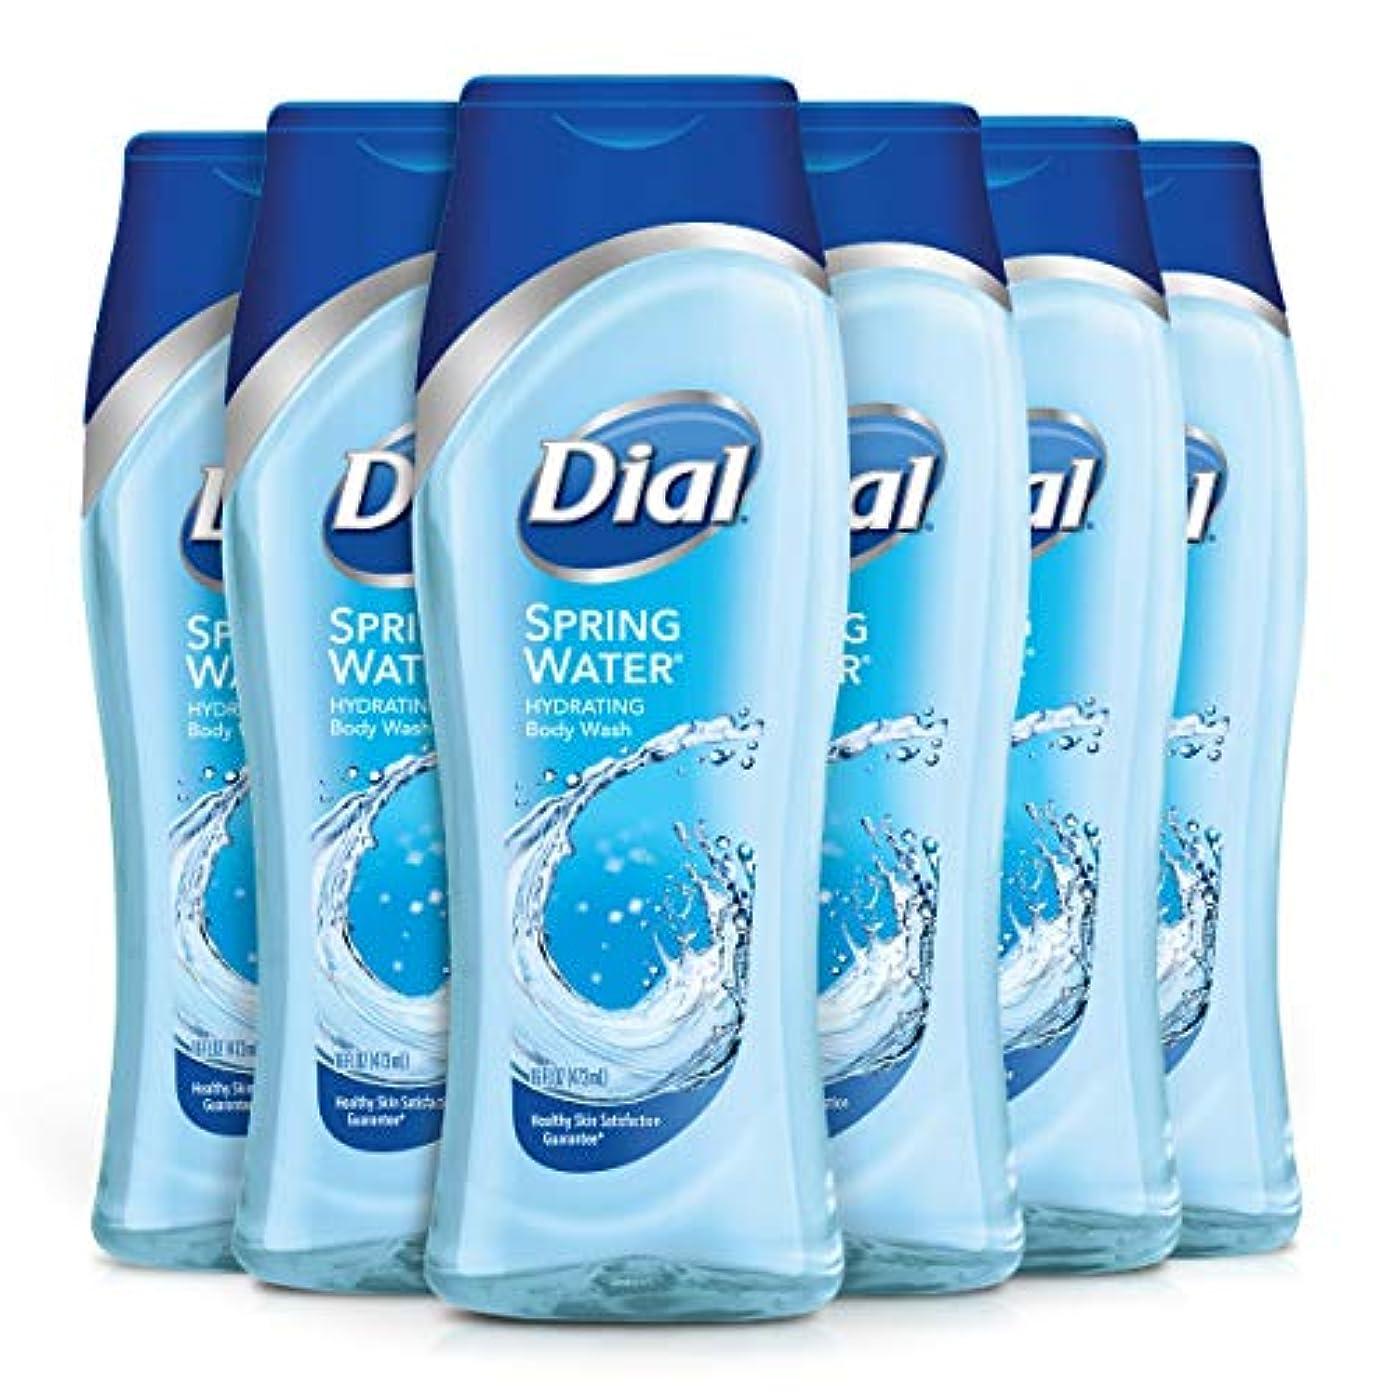 Spring Water Hydrating Body Wash